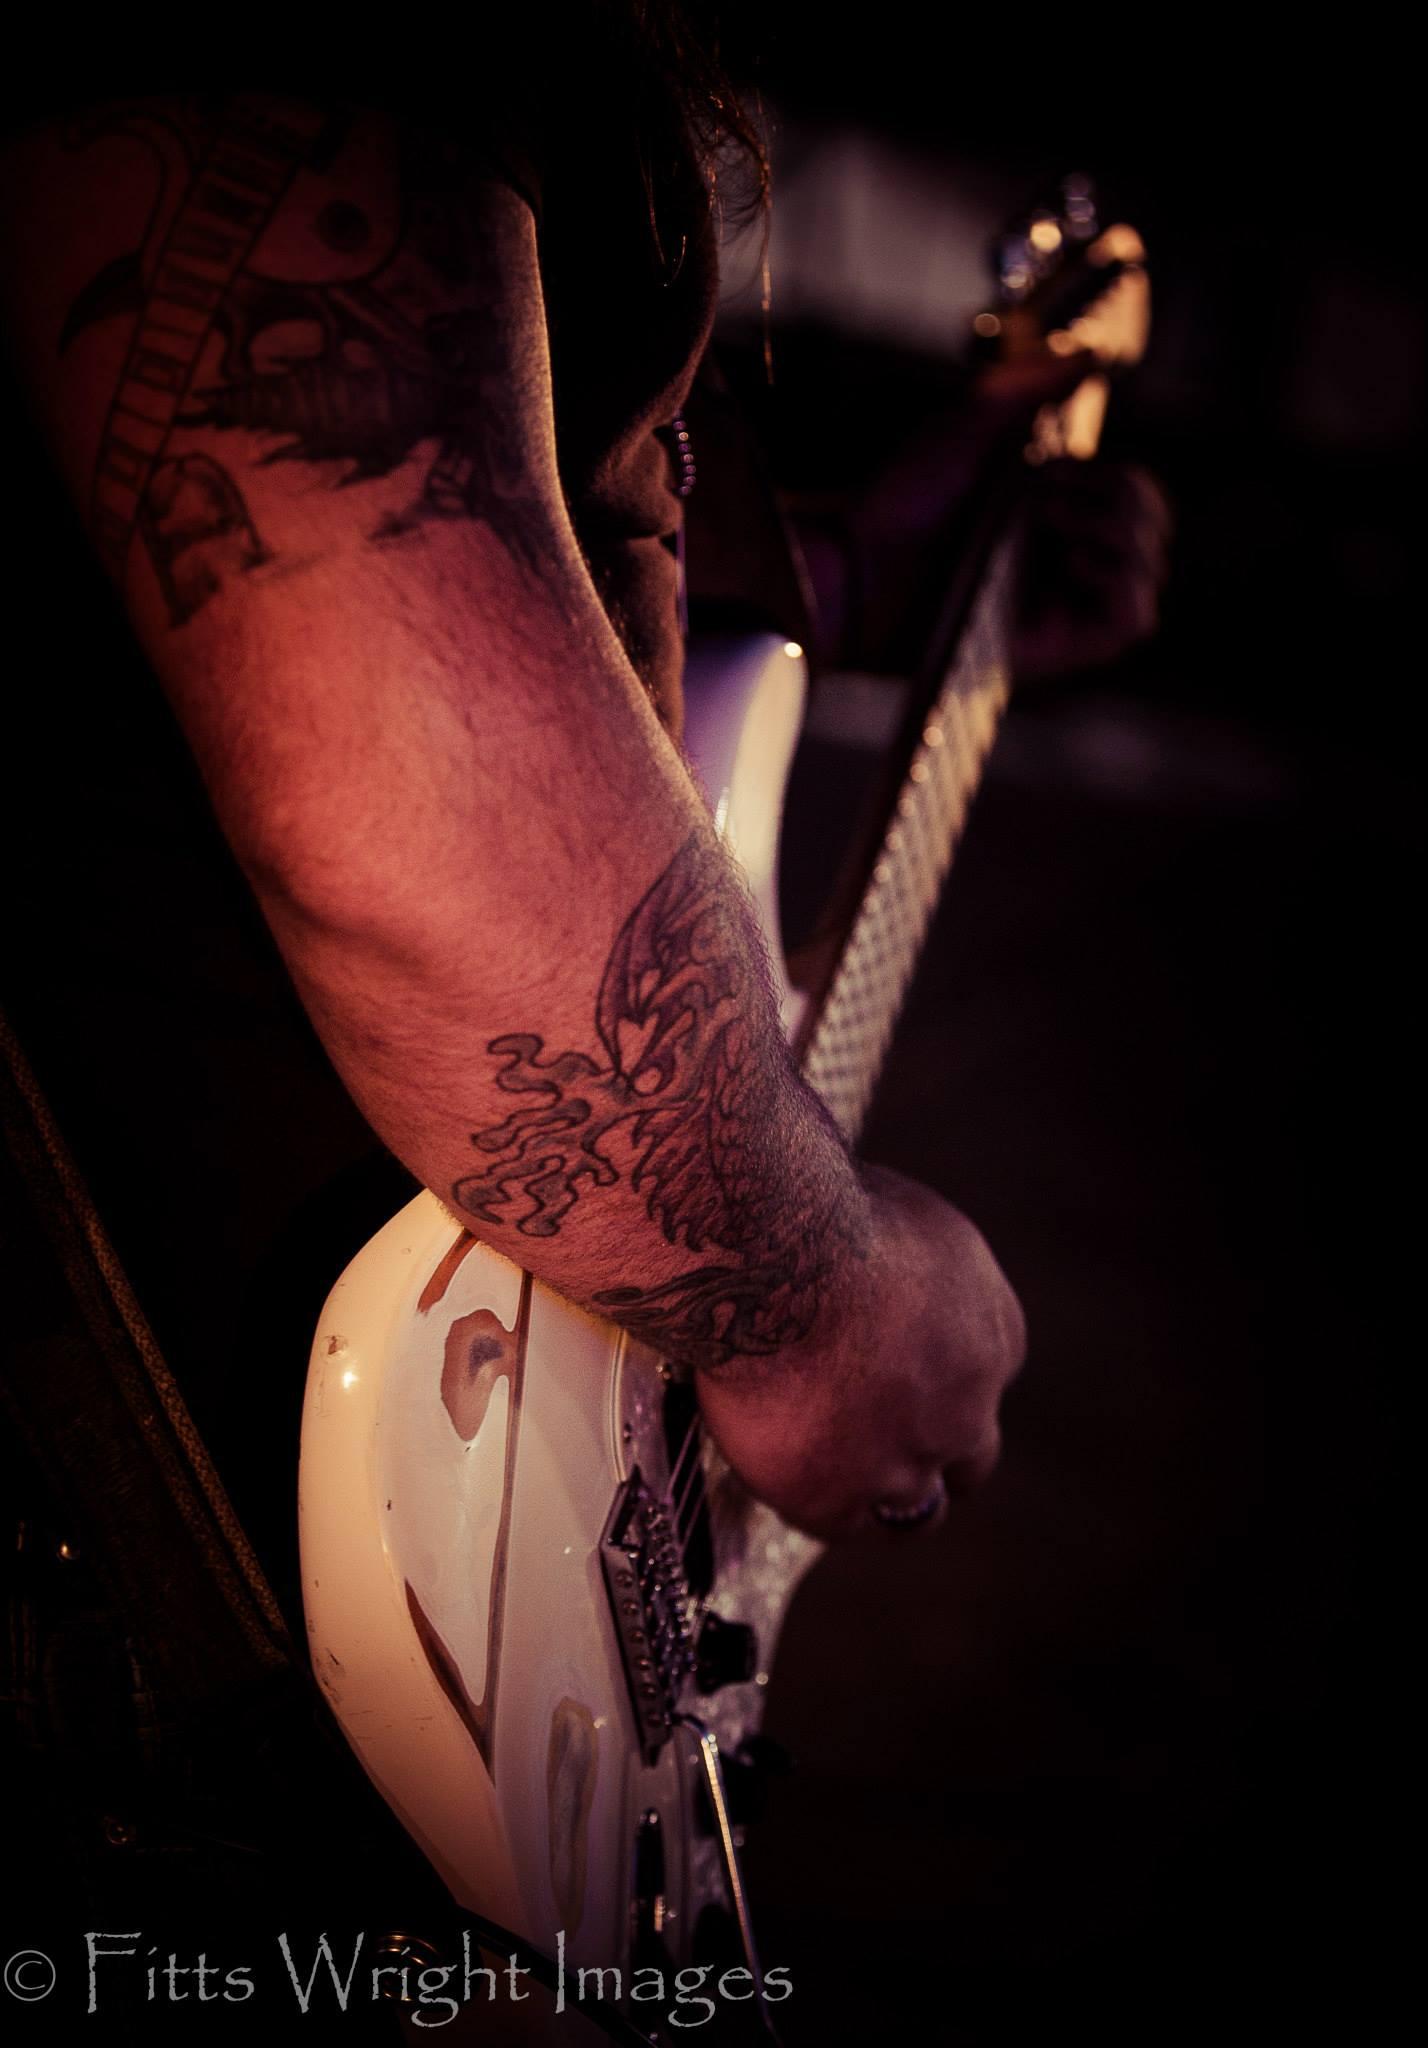 Guitar & Tattoos